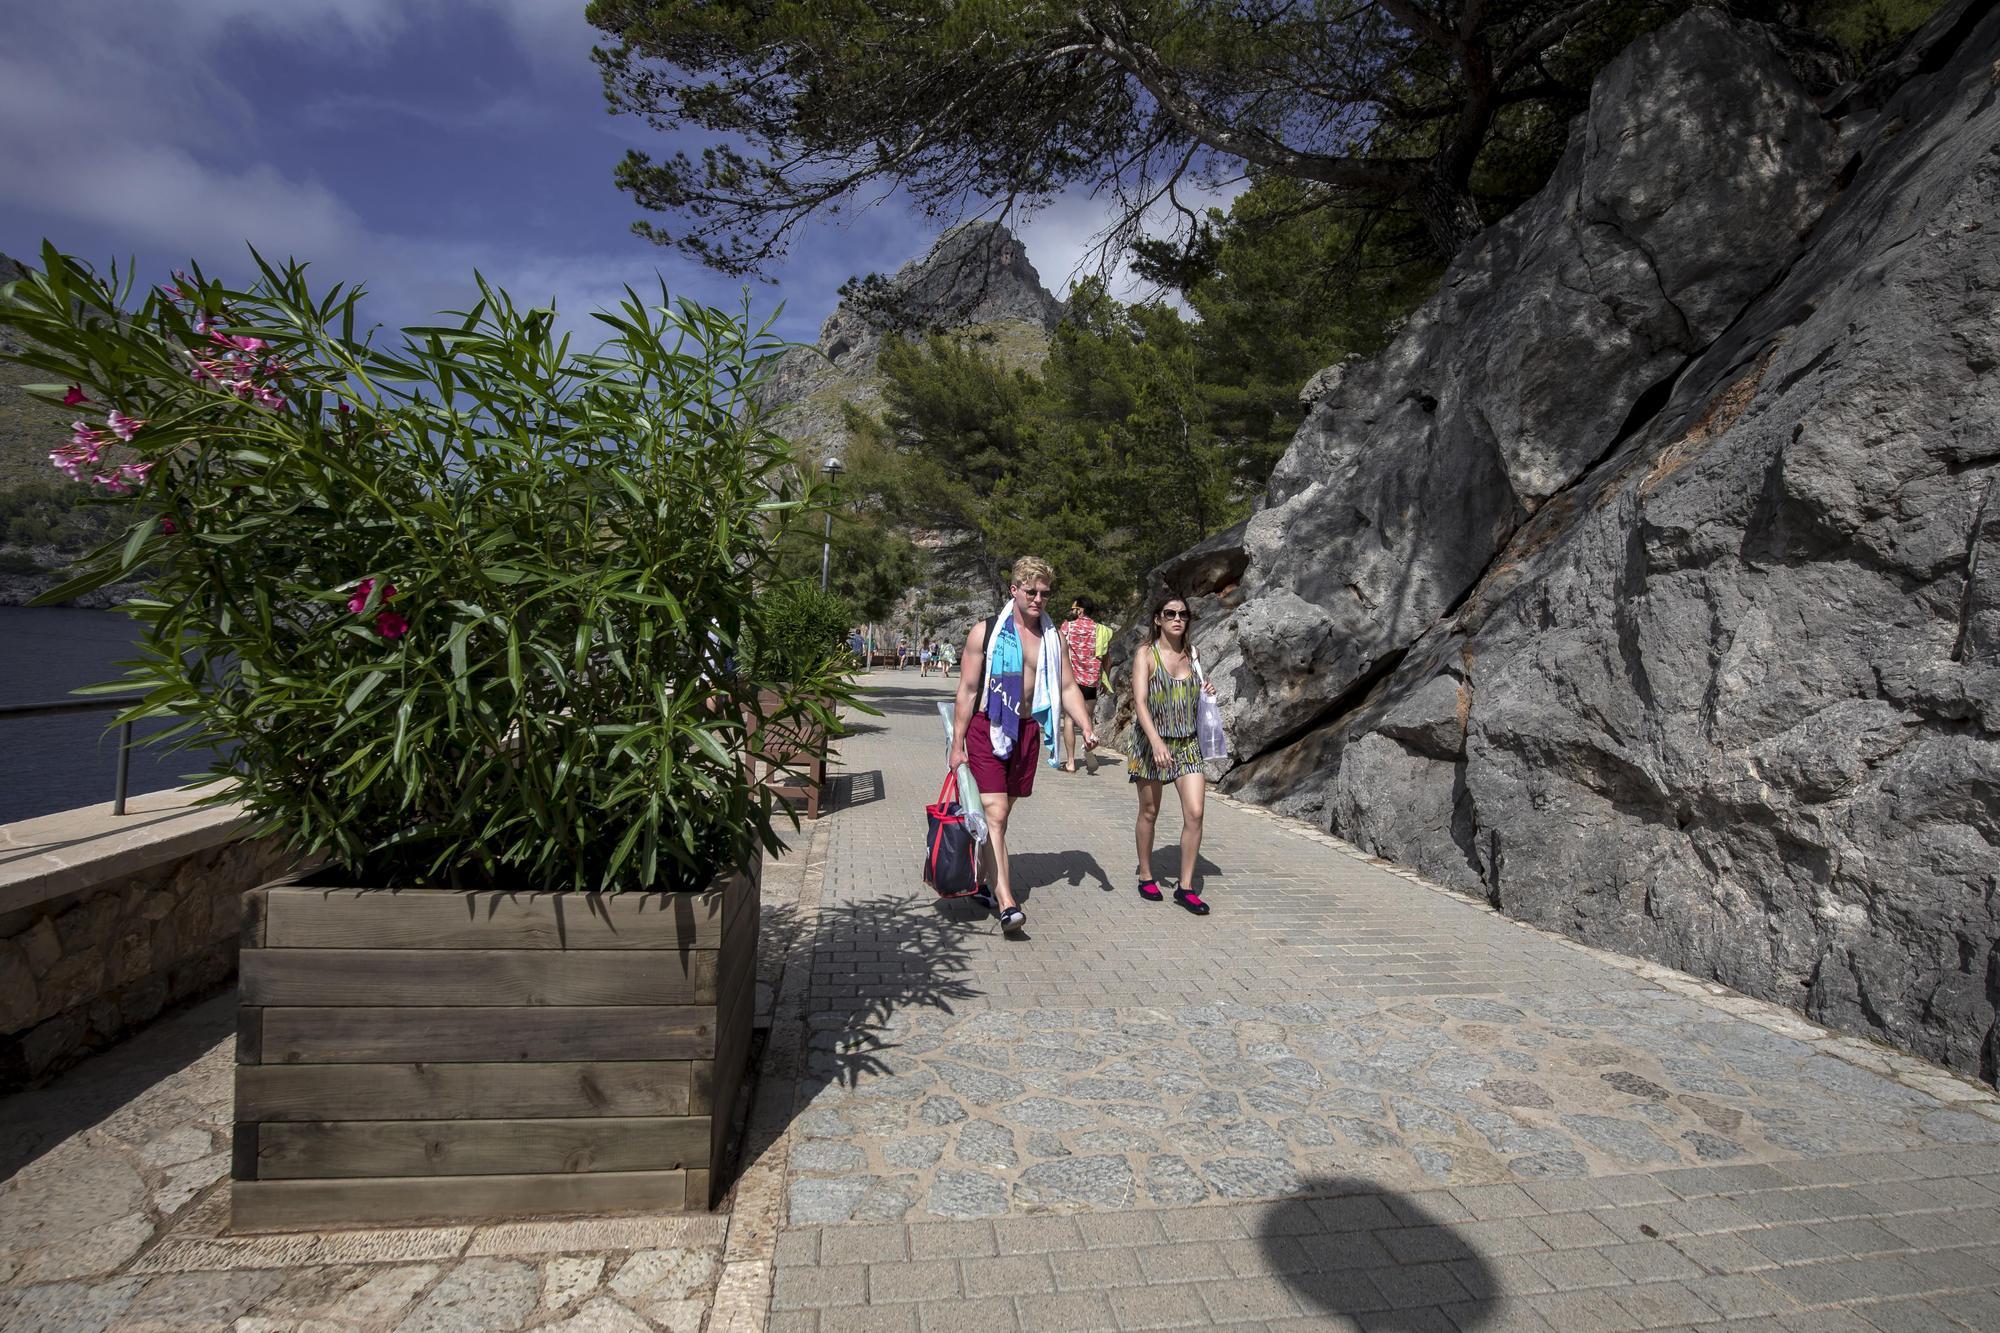 Sa Calobra, rincón mágico de la Serra de Tramuntana